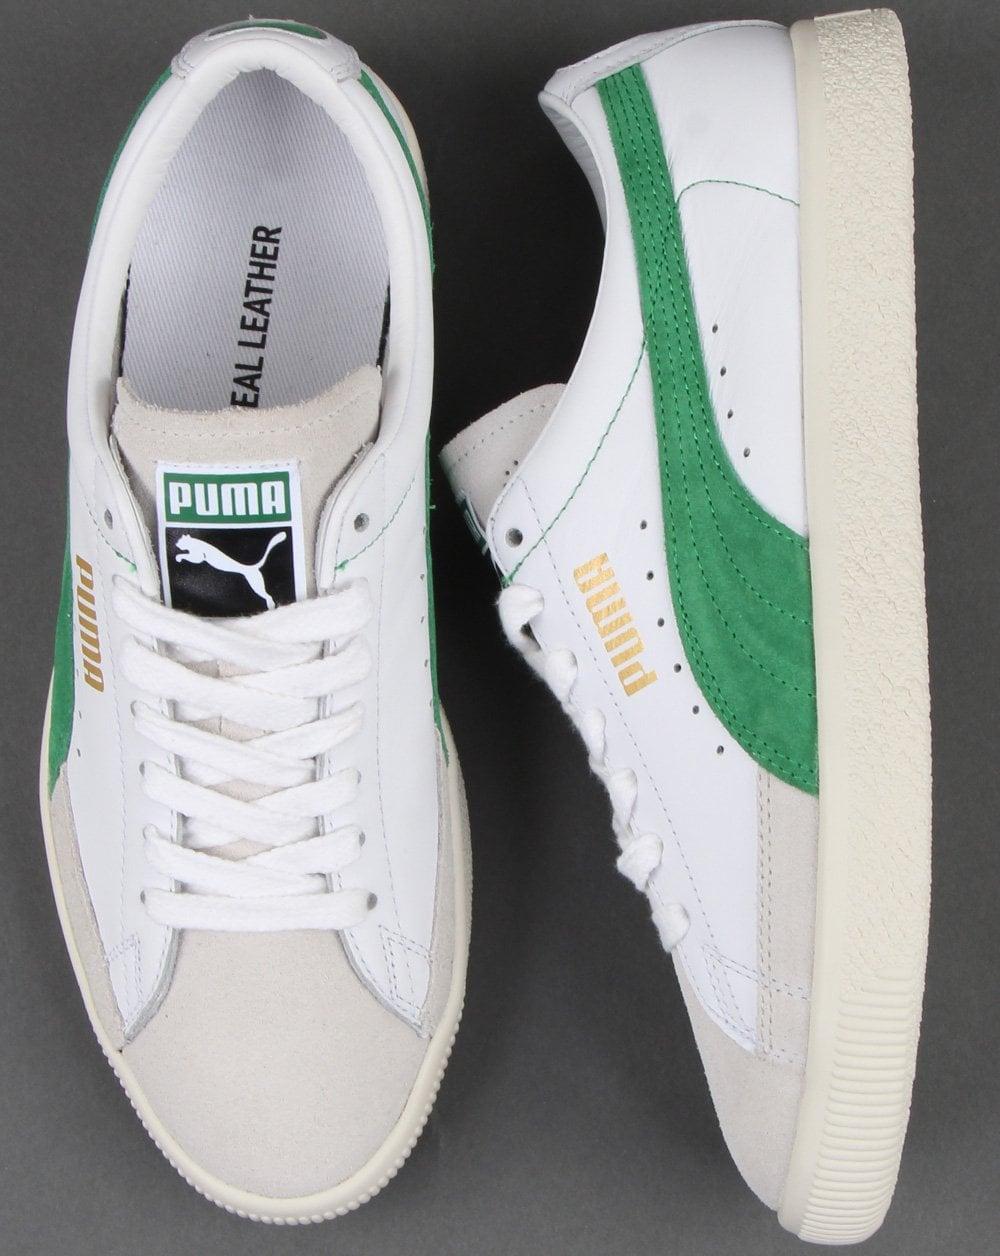 d1c81c8b49226 Puma Basket Trainer White/amazon Green